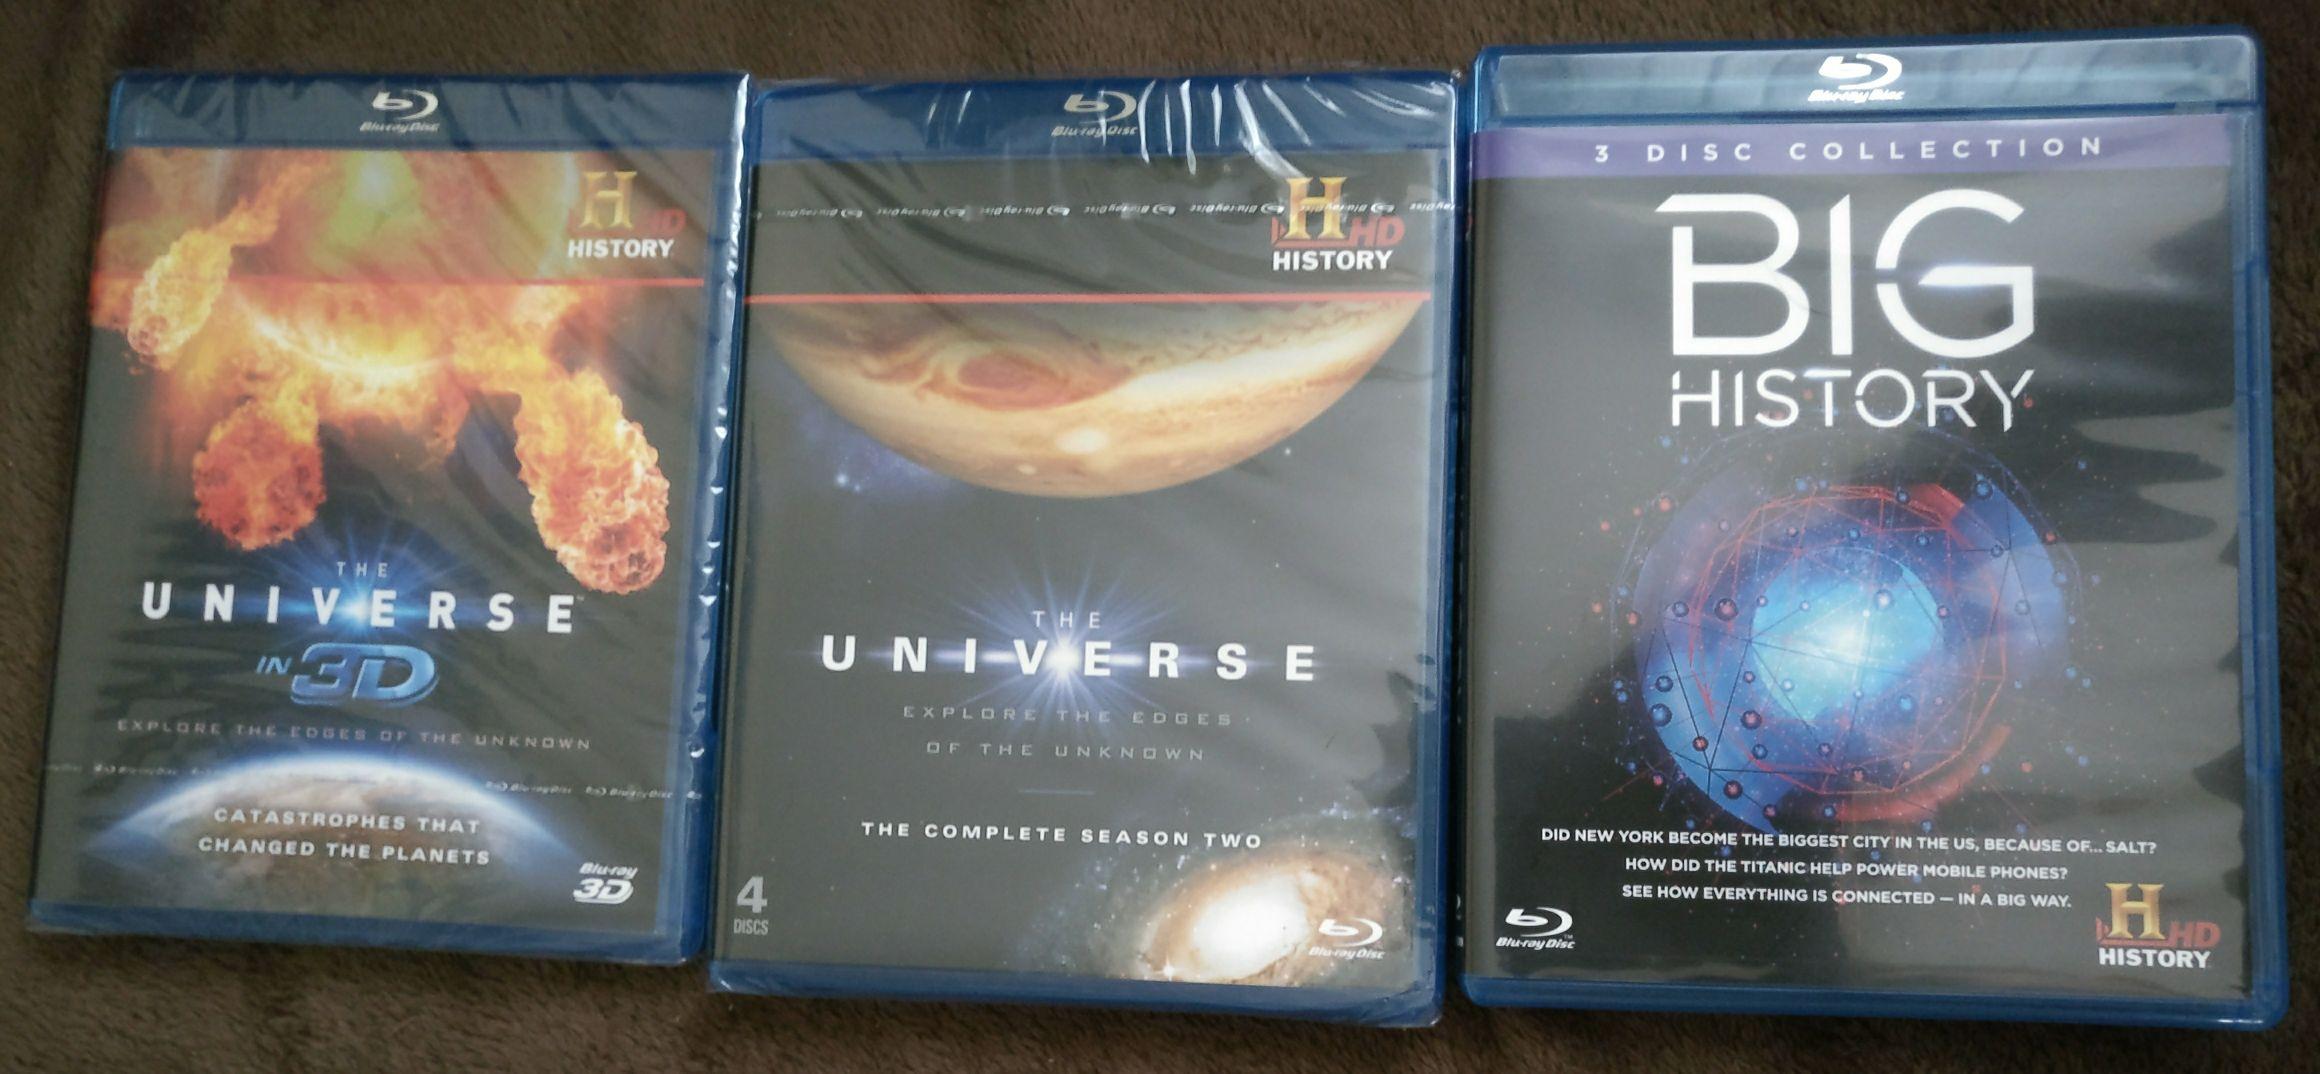 Blu-ray history boxsets £1 in poundland